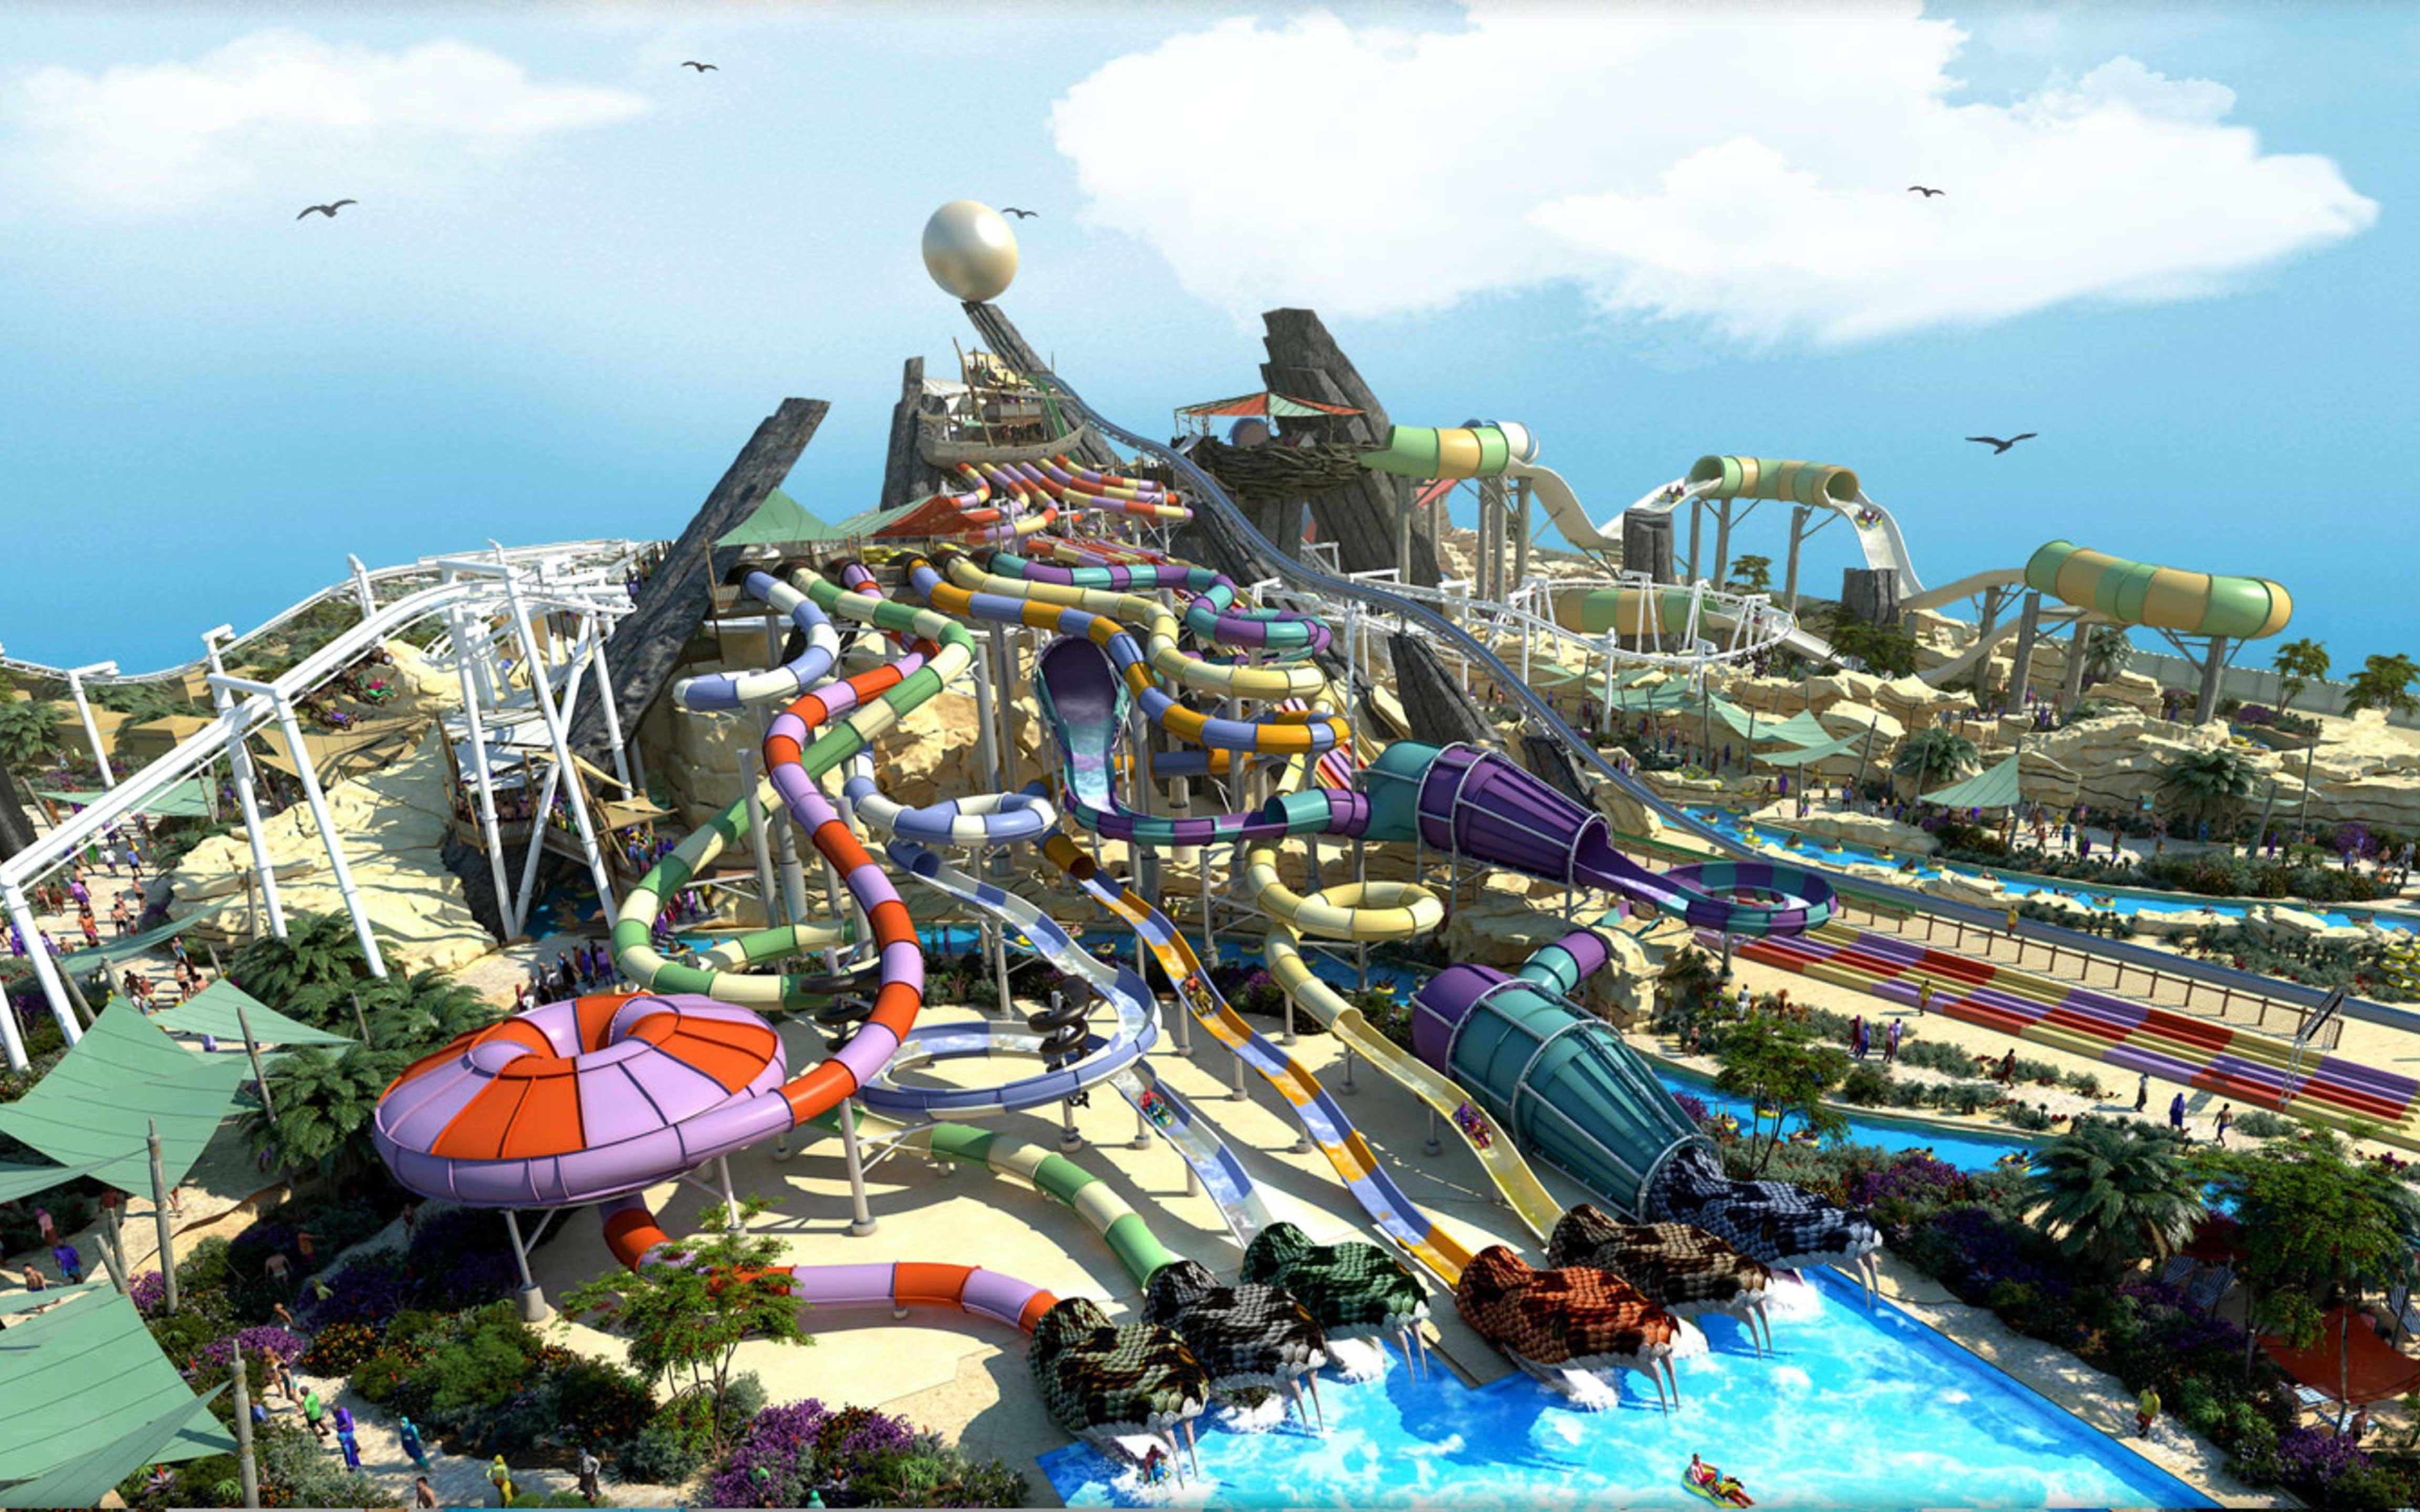 best-water-parks-in-dubai-aquaventure-water-park